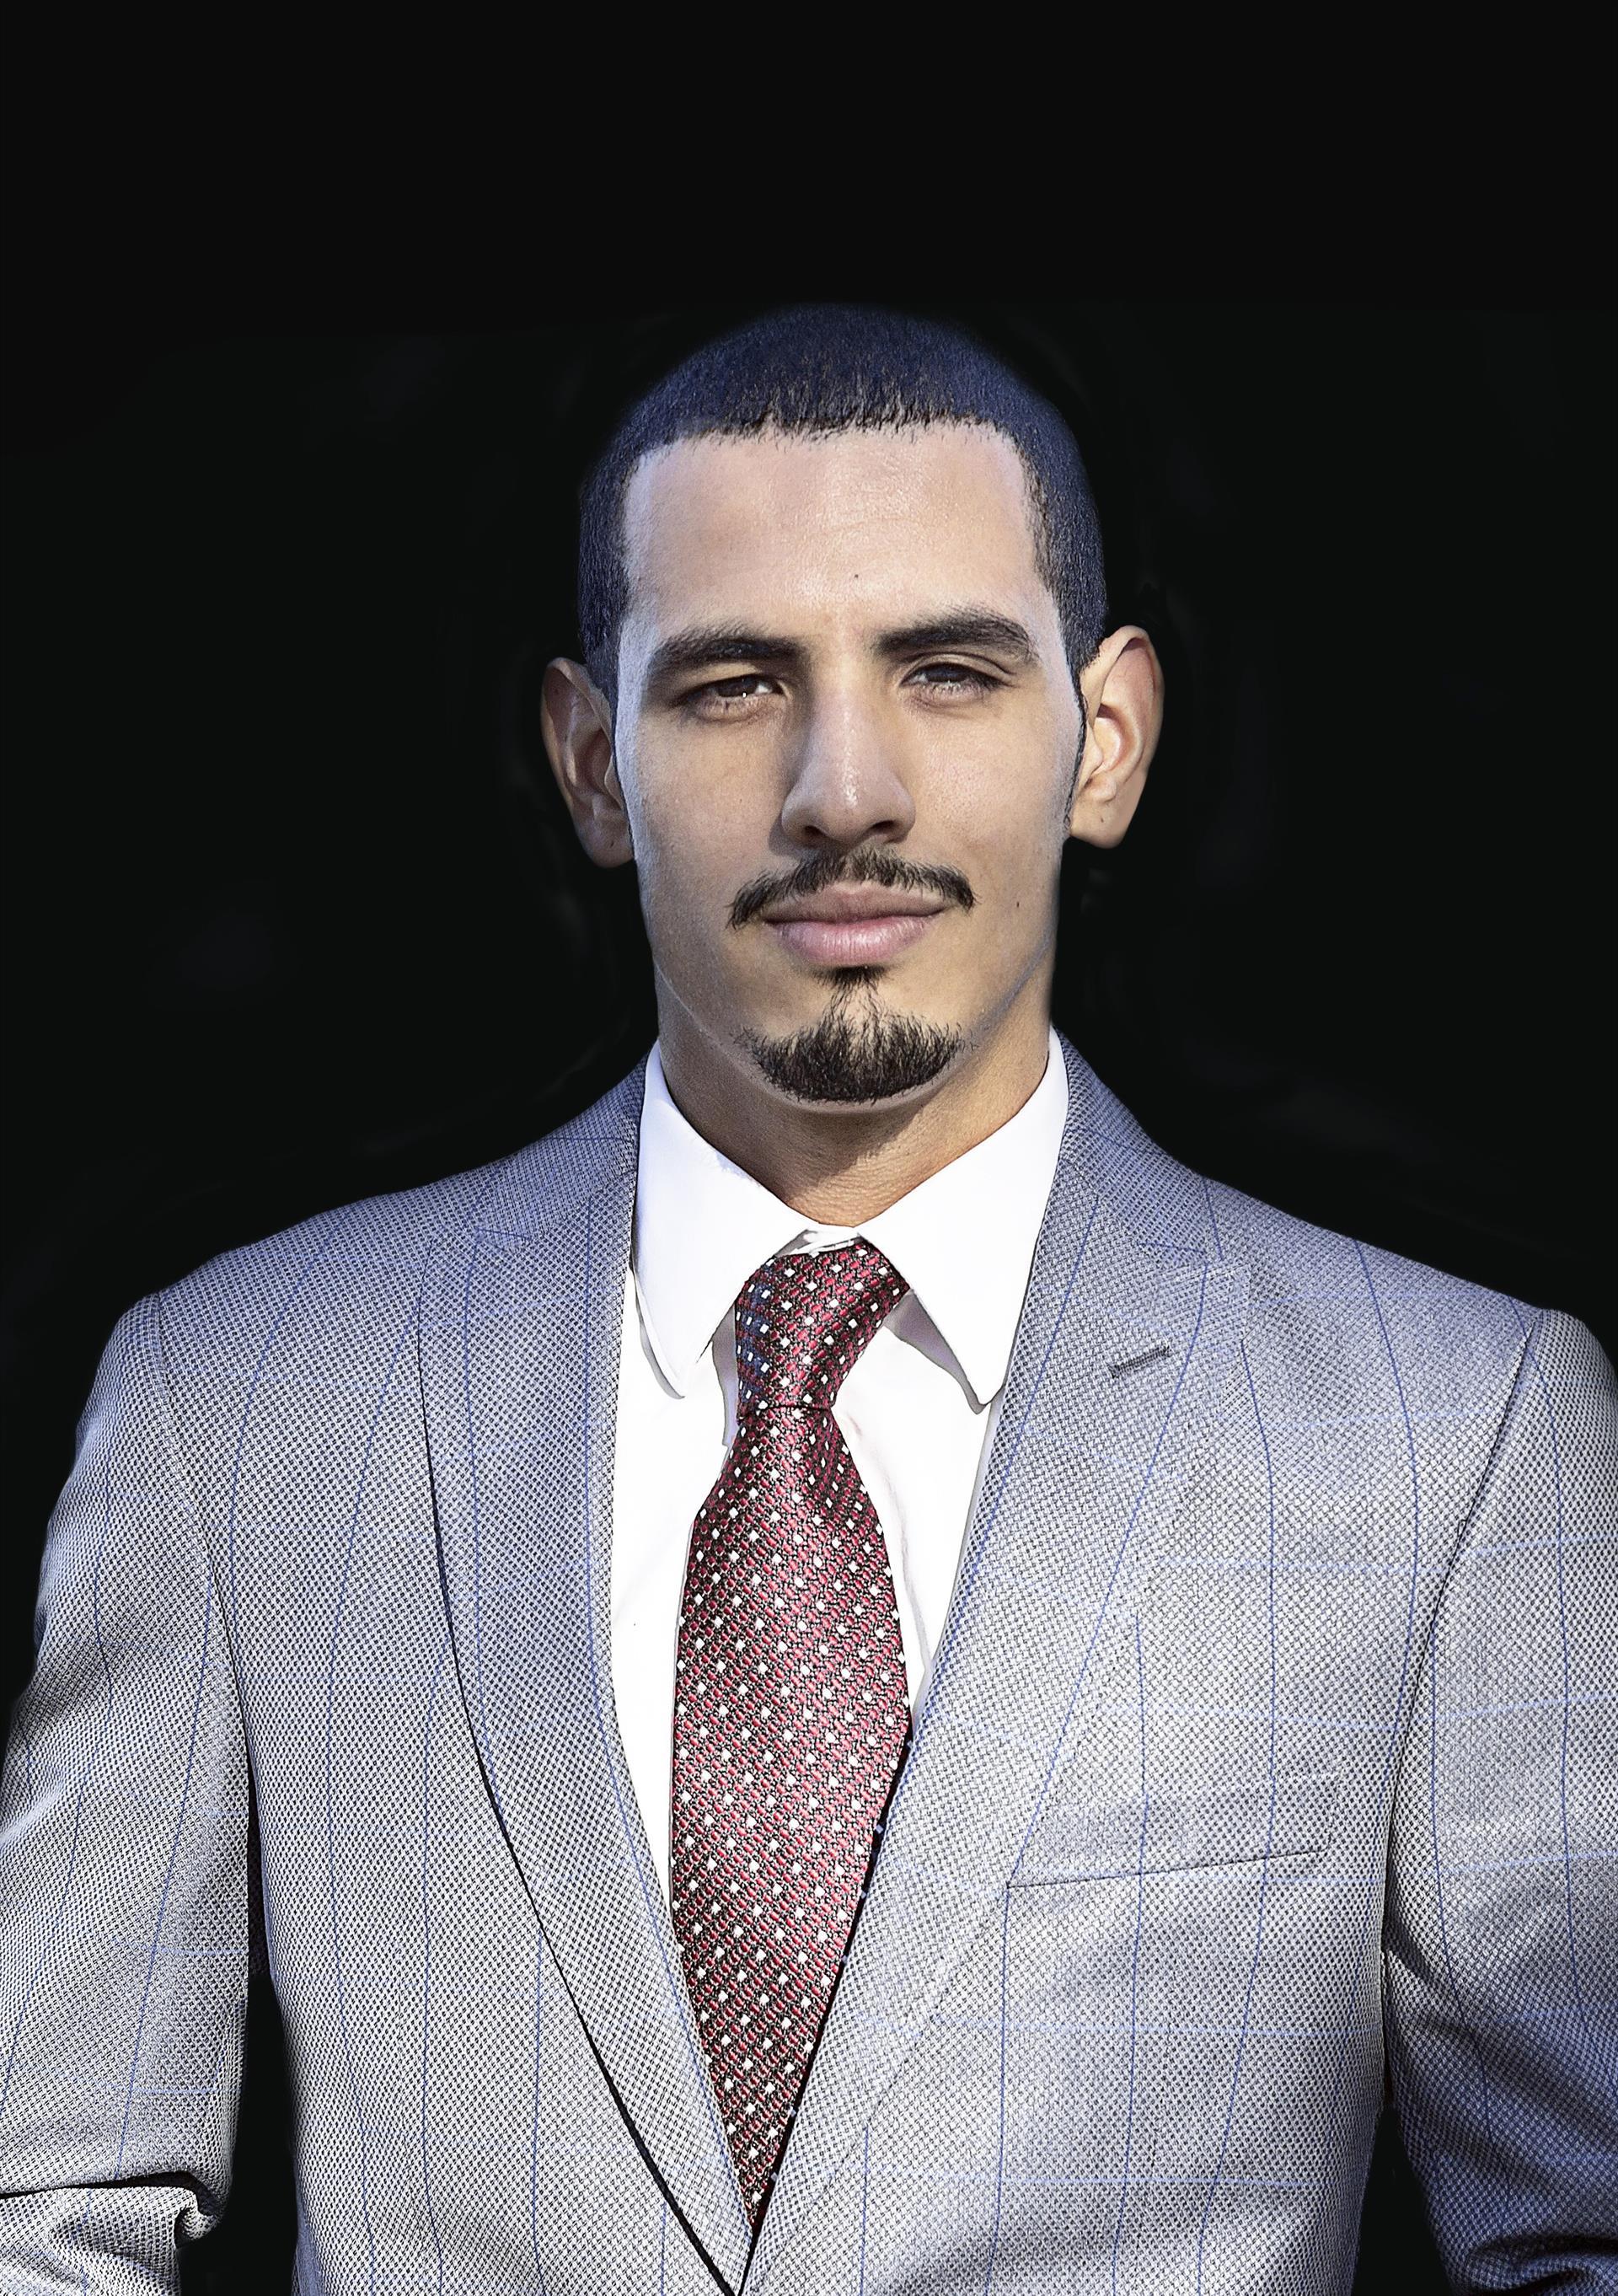 Justin A. Carbajal